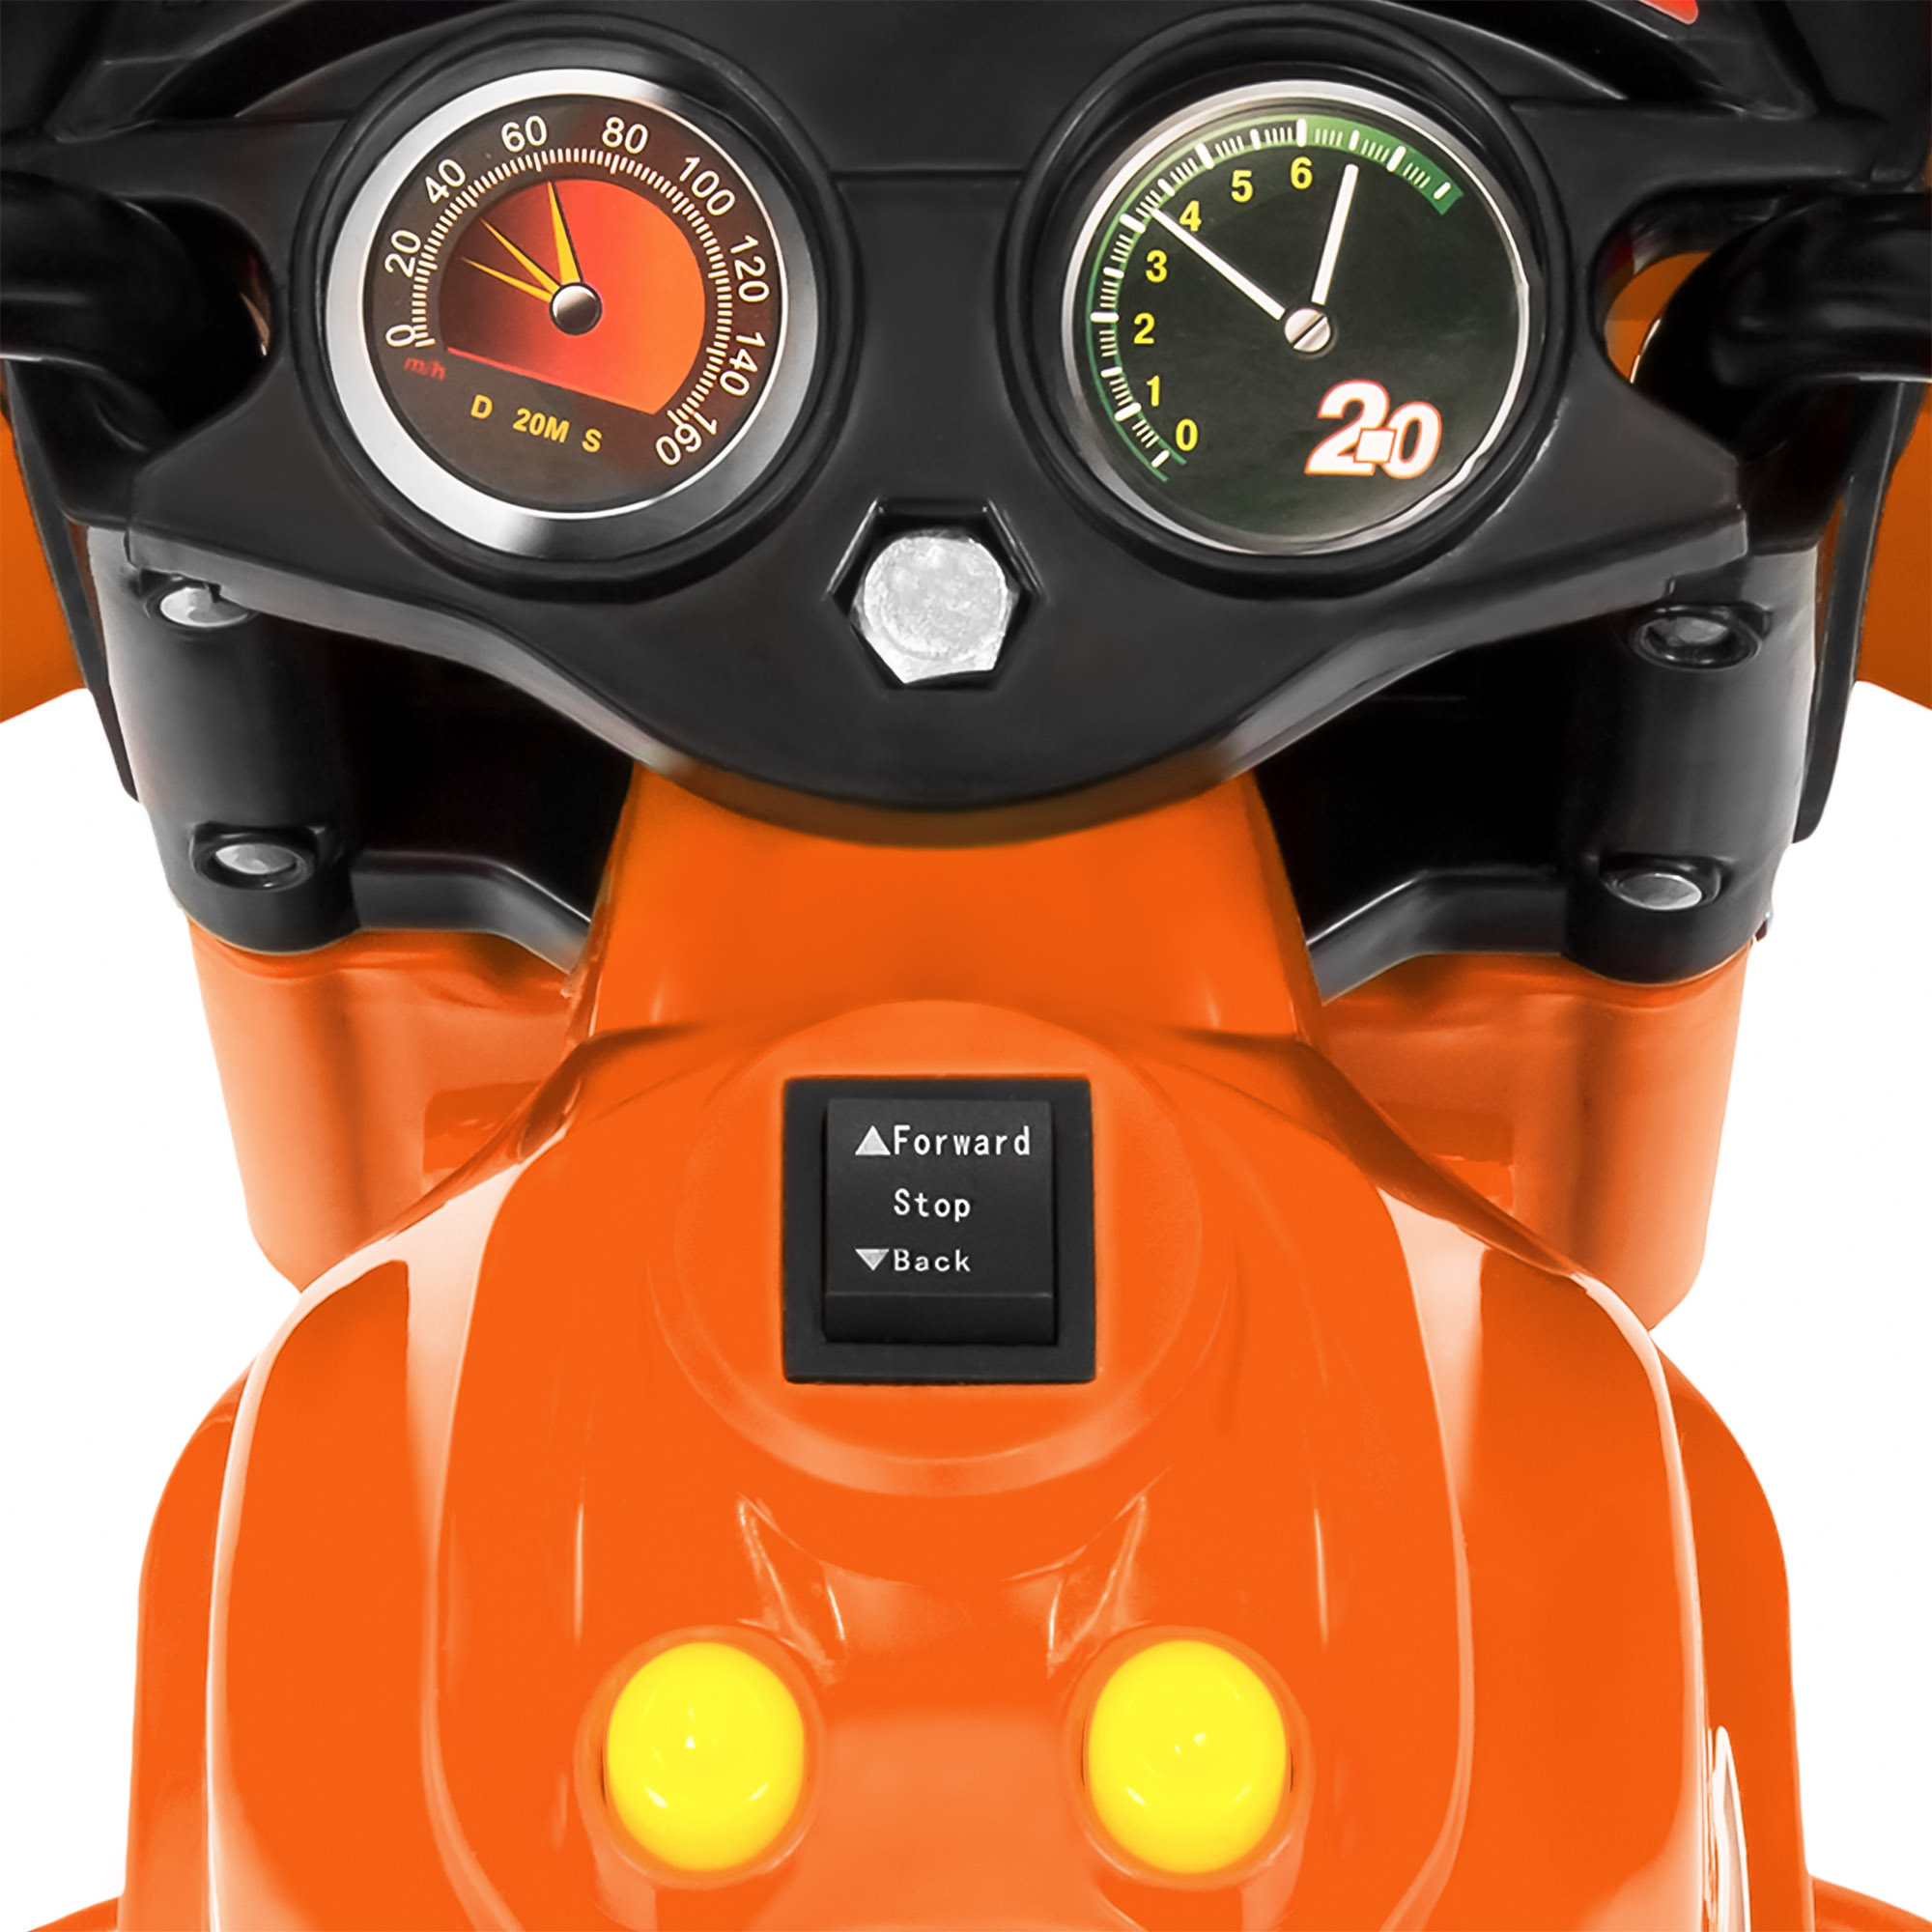 BCP-6V-Kids-3-Wheel-Motorcycle-Ride-On-Toy-w-LED-Lights-Music-Storage thumbnail 24